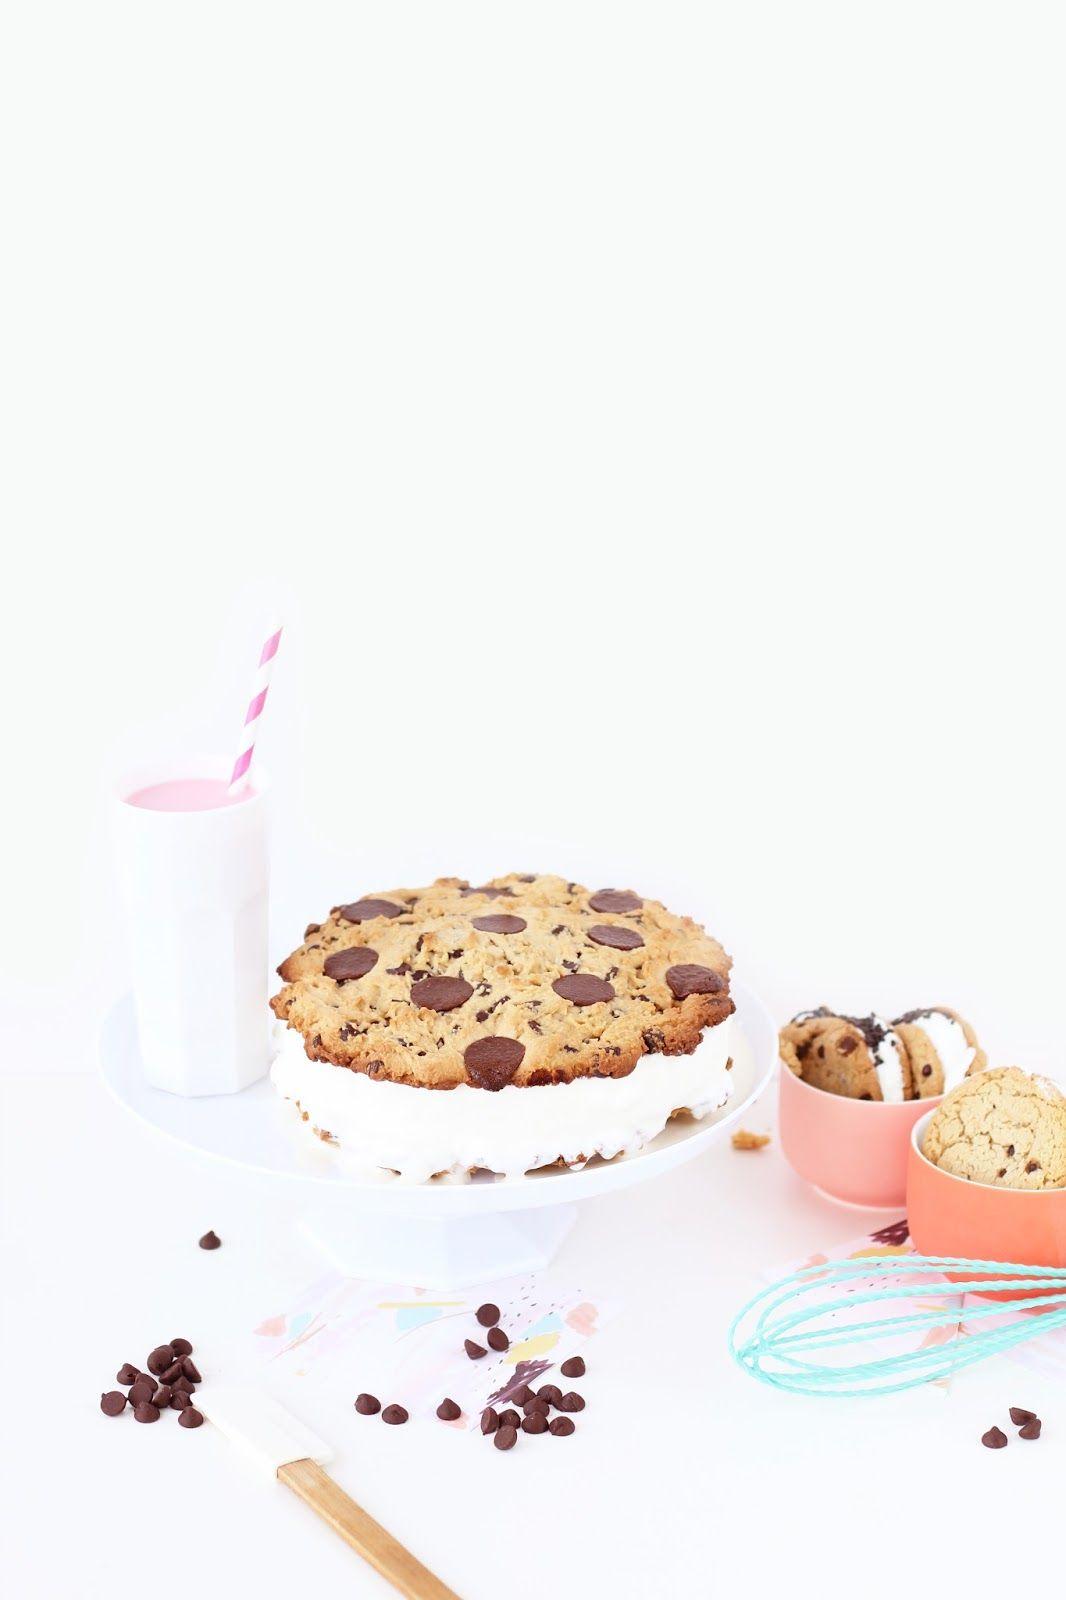 Giant Chocolate Chip Cookie Ice Cream Sandwich Cake